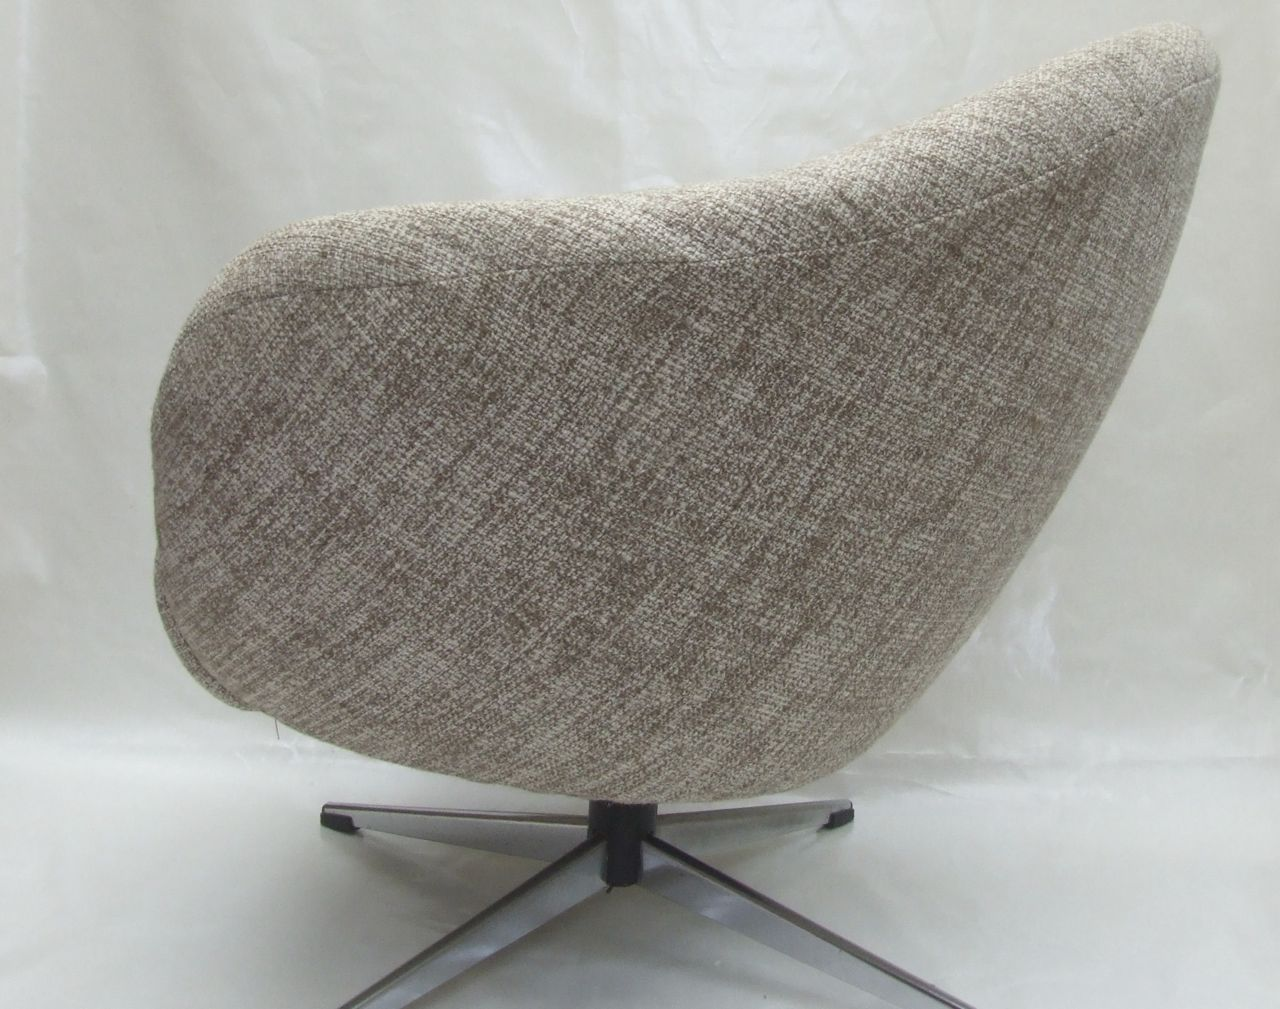 Merveilleux ... 1960s Tub Chairs2_swivel Base ...